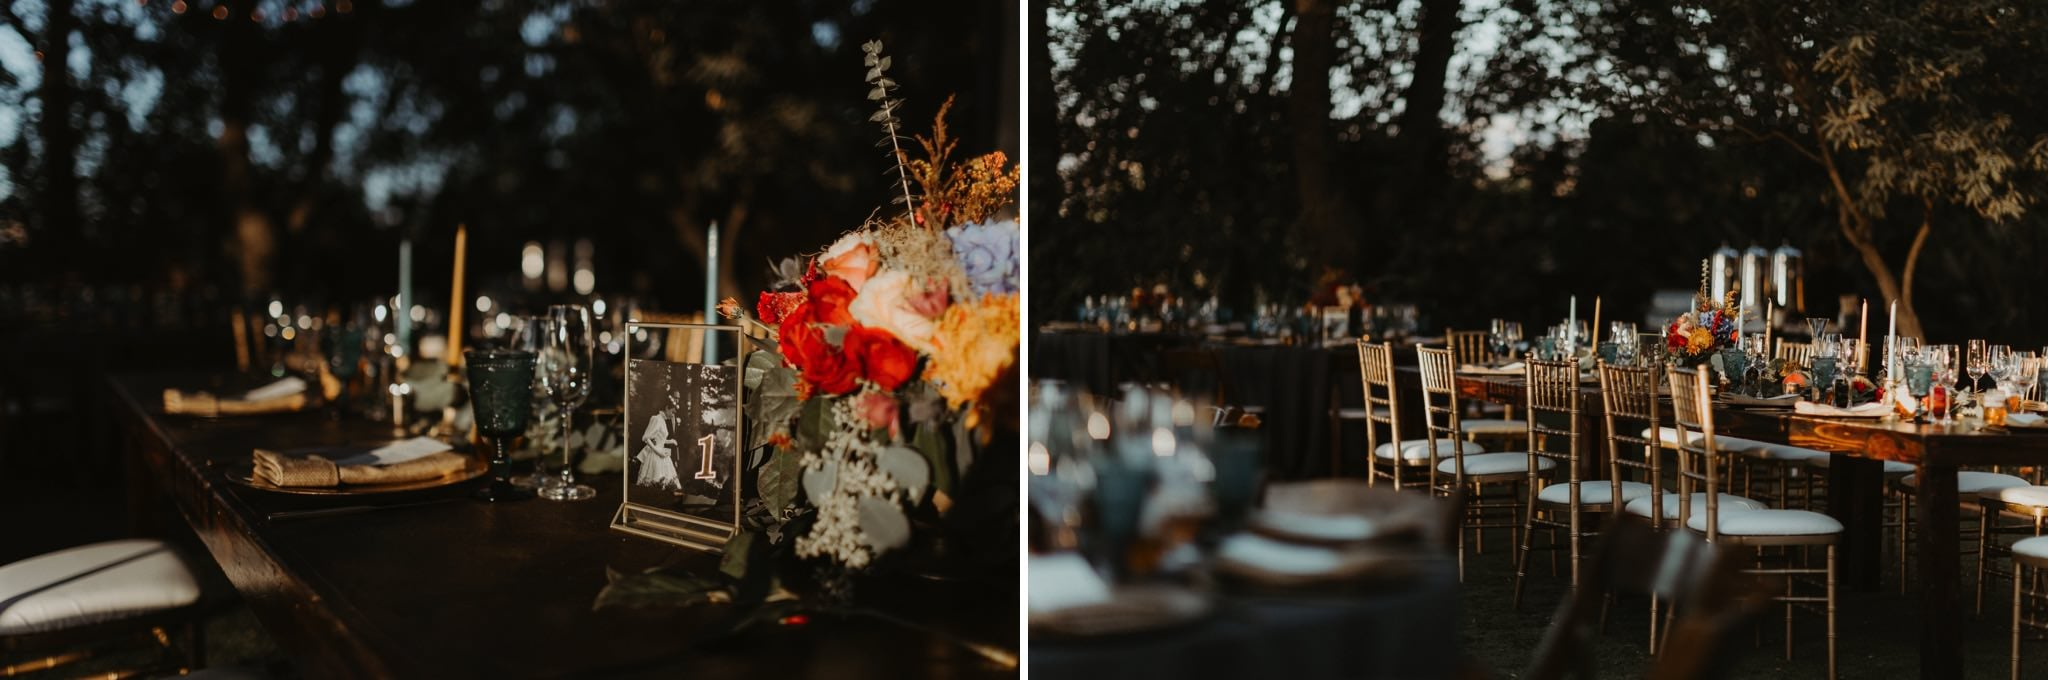 simi valley wedding photography 142